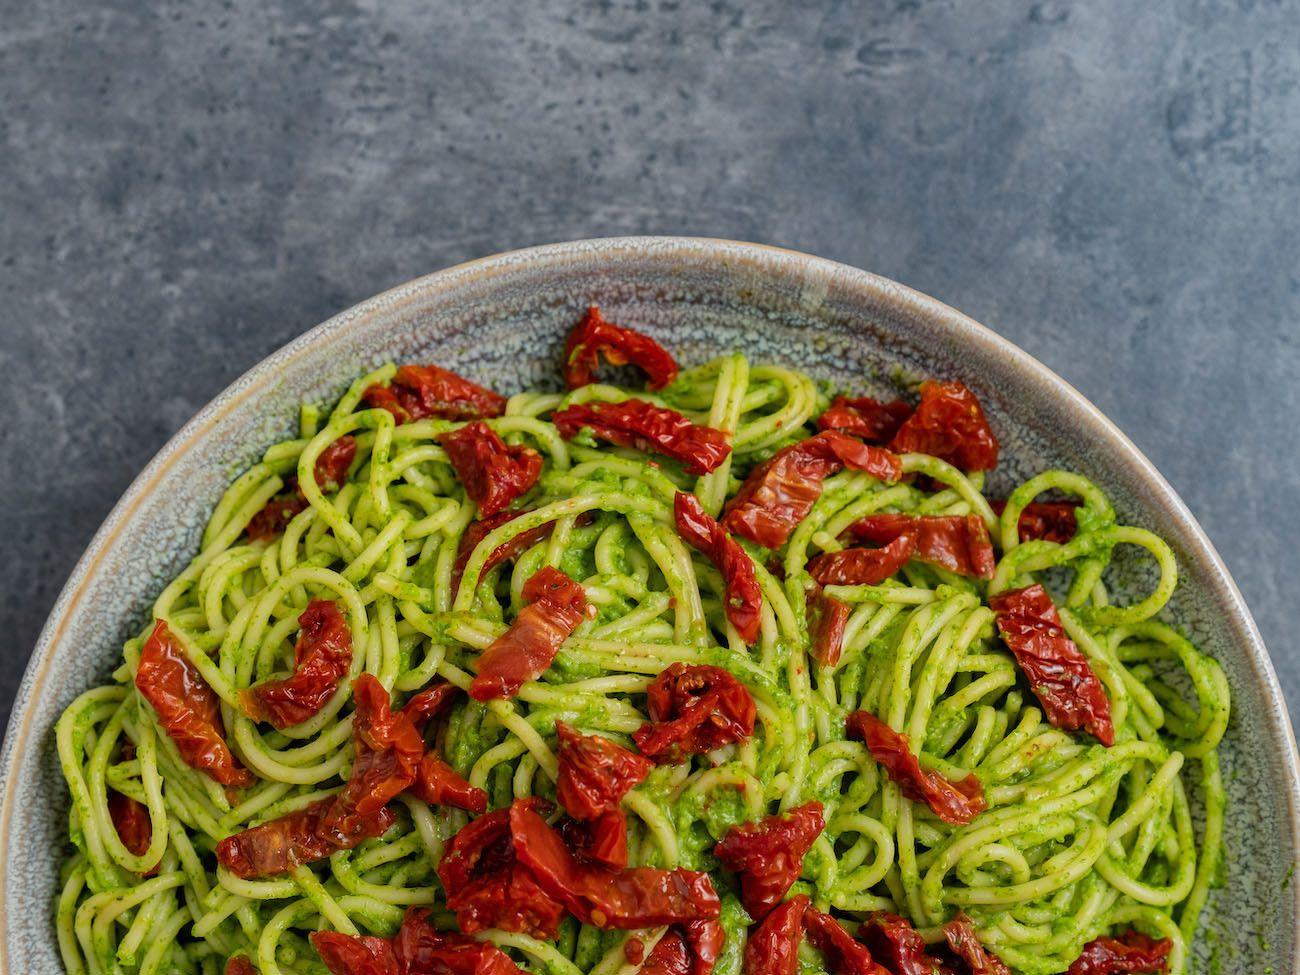 Foodblog, Rezept Spaghetti mit Avocado-Rucola-Pesto und getrockenten Tomaten, Teller, Vegan, Pasta